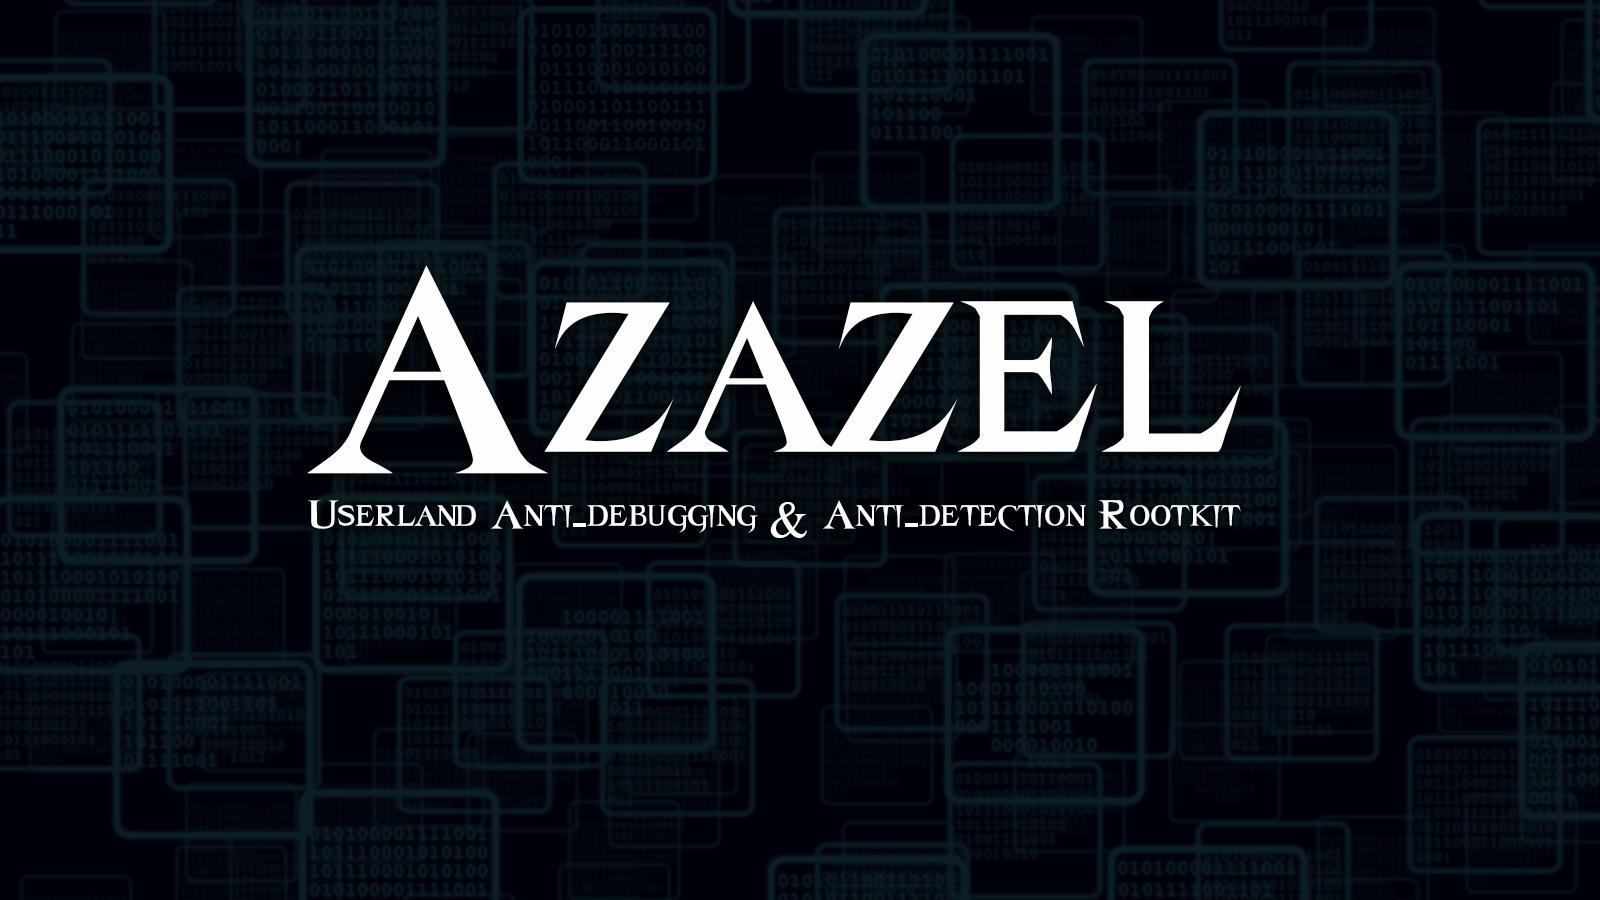 Azazel Userland Rootkit